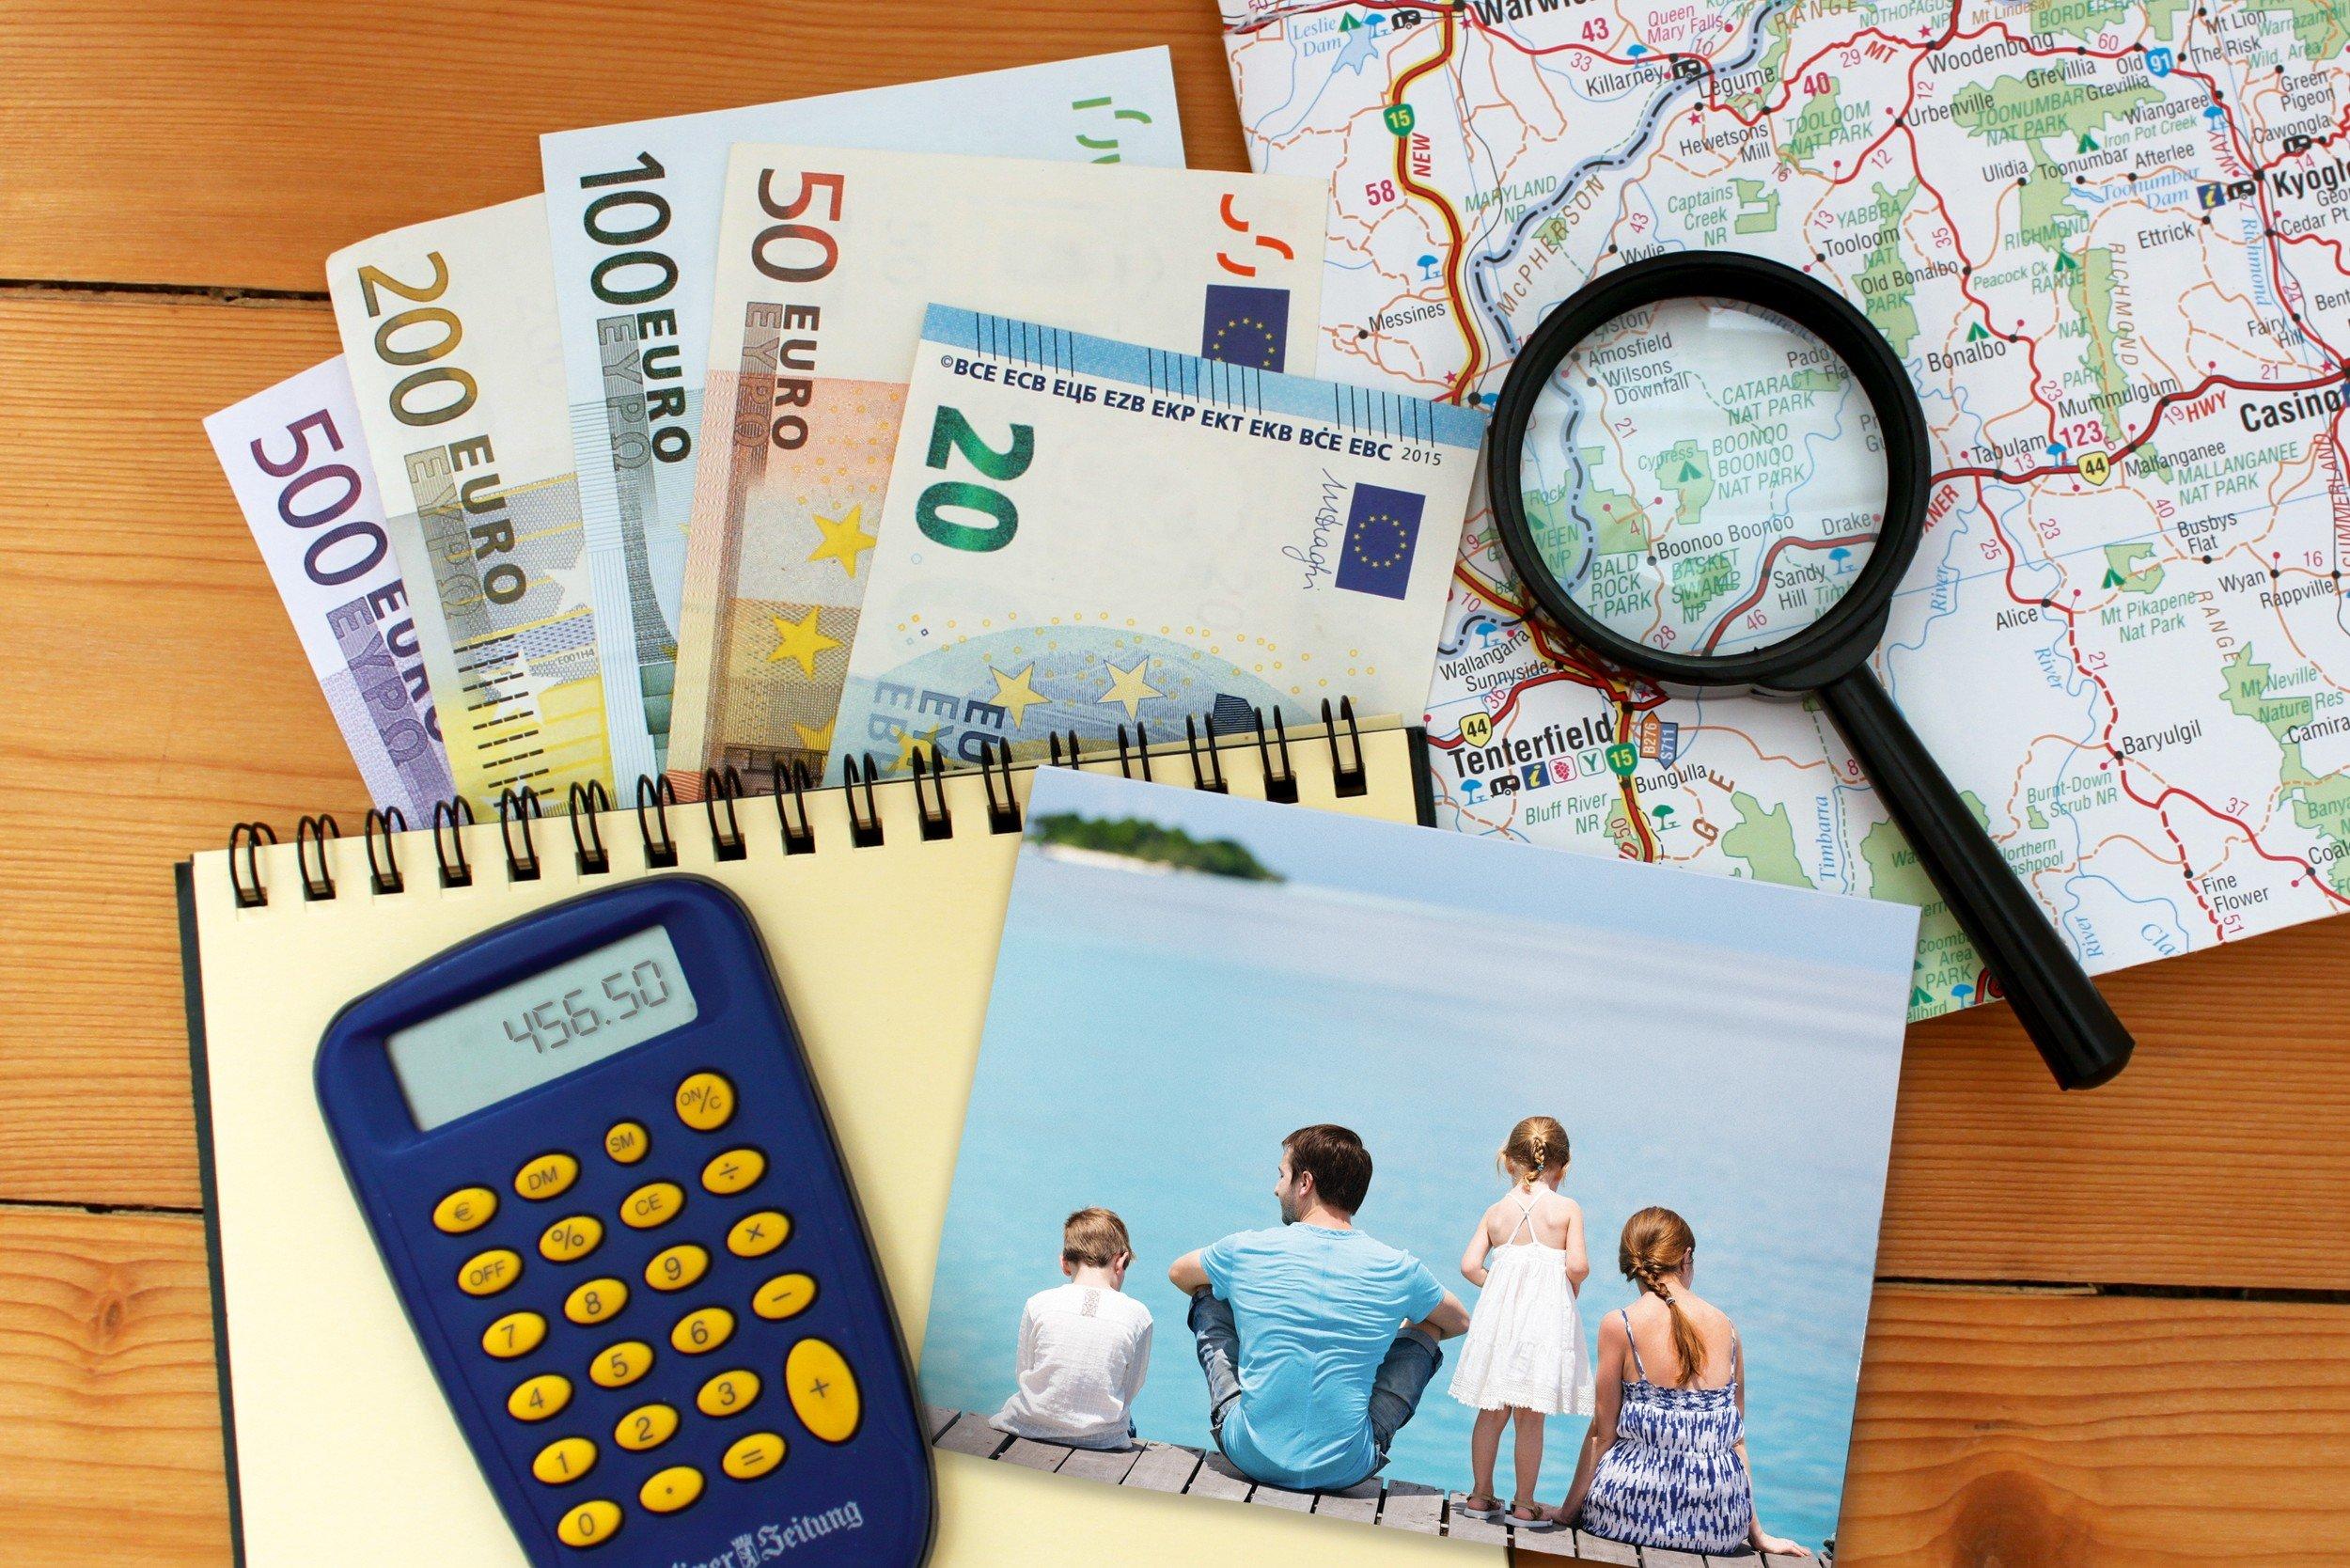 Reisebudget-Planung für Familien leicht gemacht © KidsAway.de